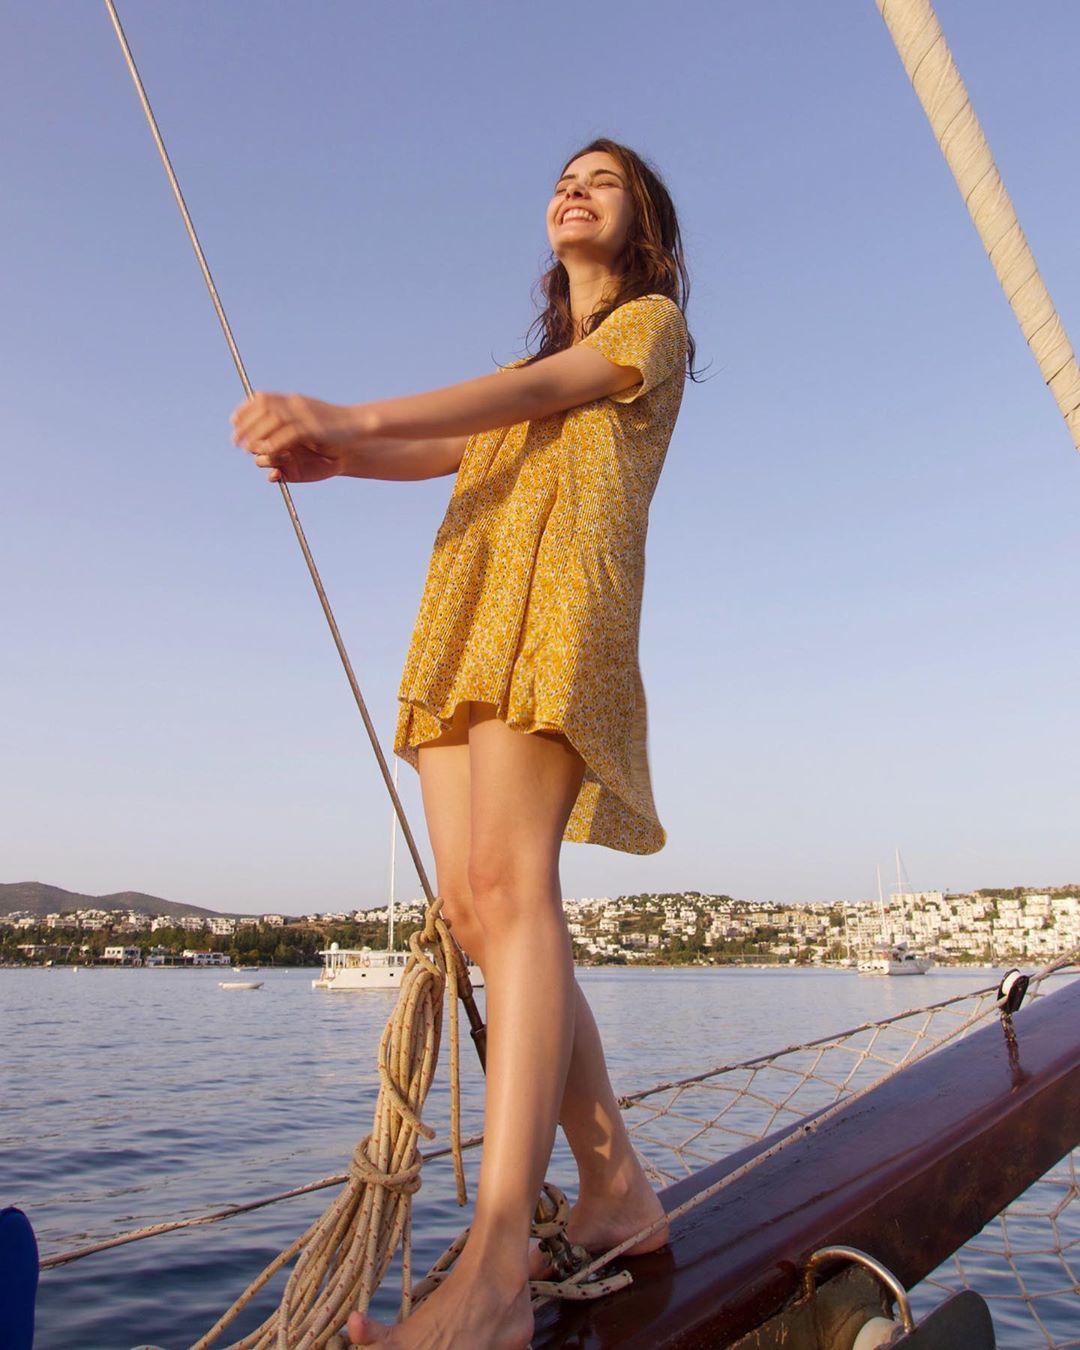 The 30-year-old Turkish actress Tulin Ece Yazkan is 1.62 meters tall and 45 kilograms